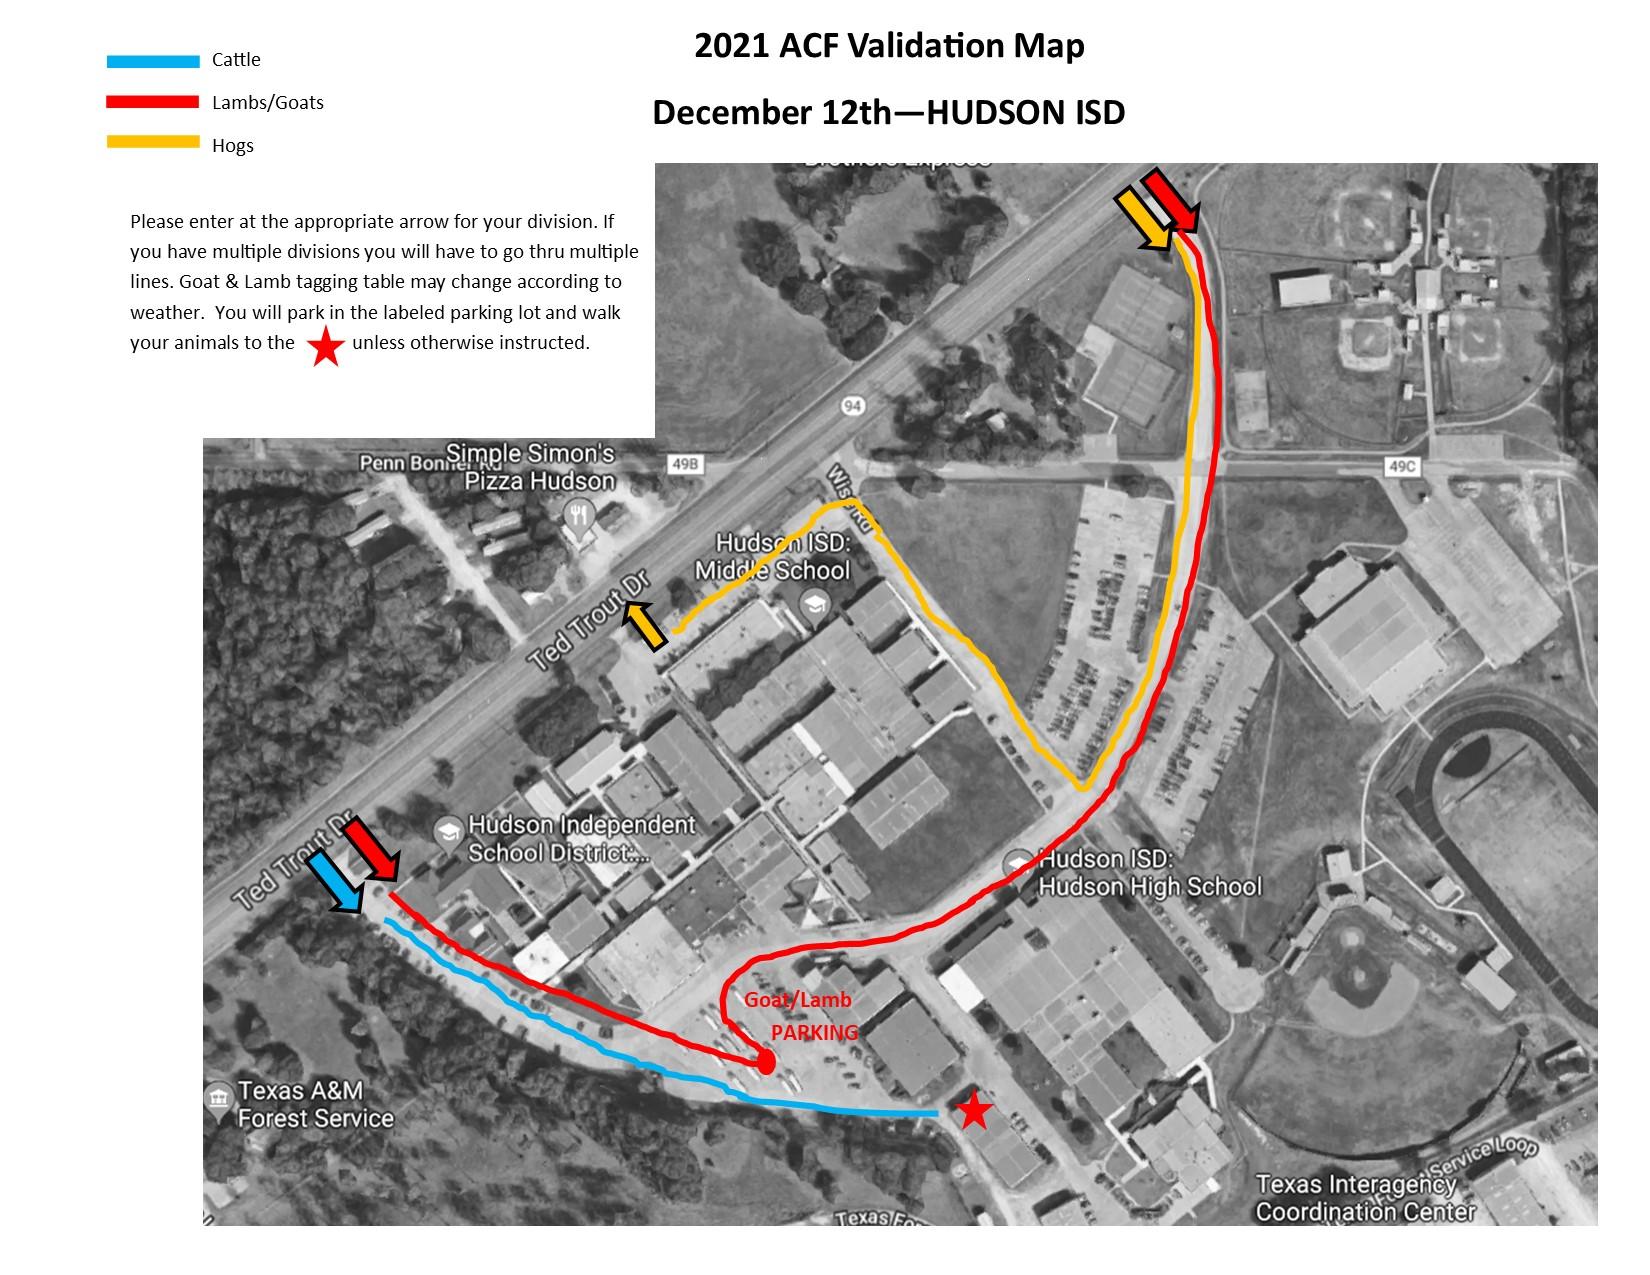 2021 Validation Map for Hudson